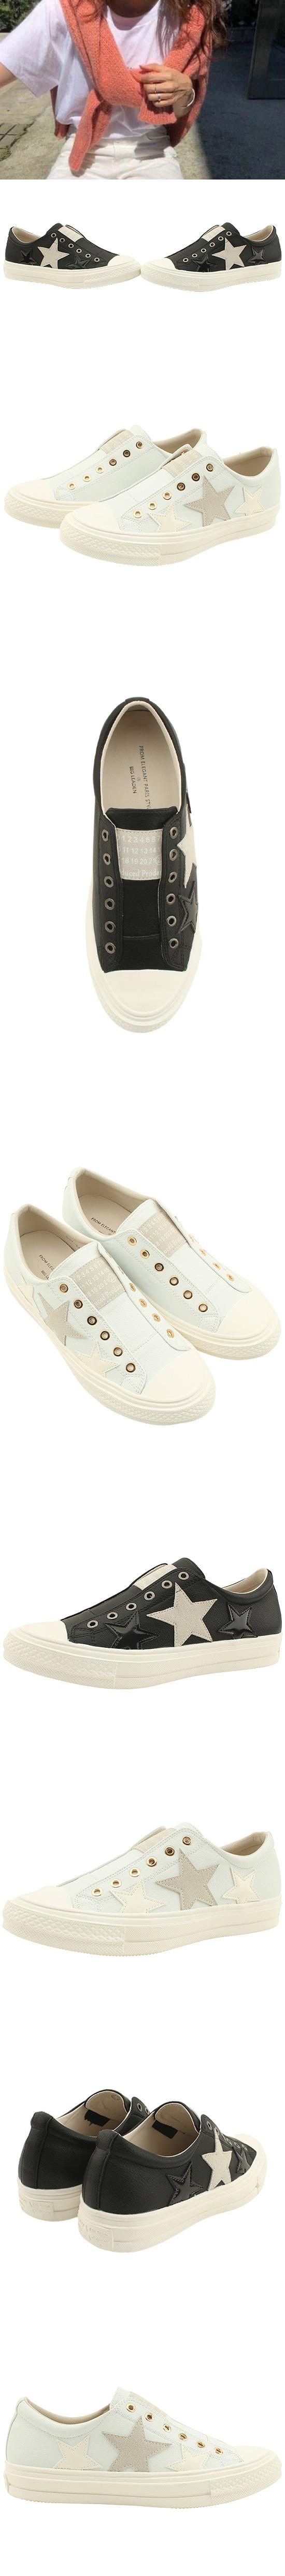 Cowhide Canvas Shoes Low Sneakers Black